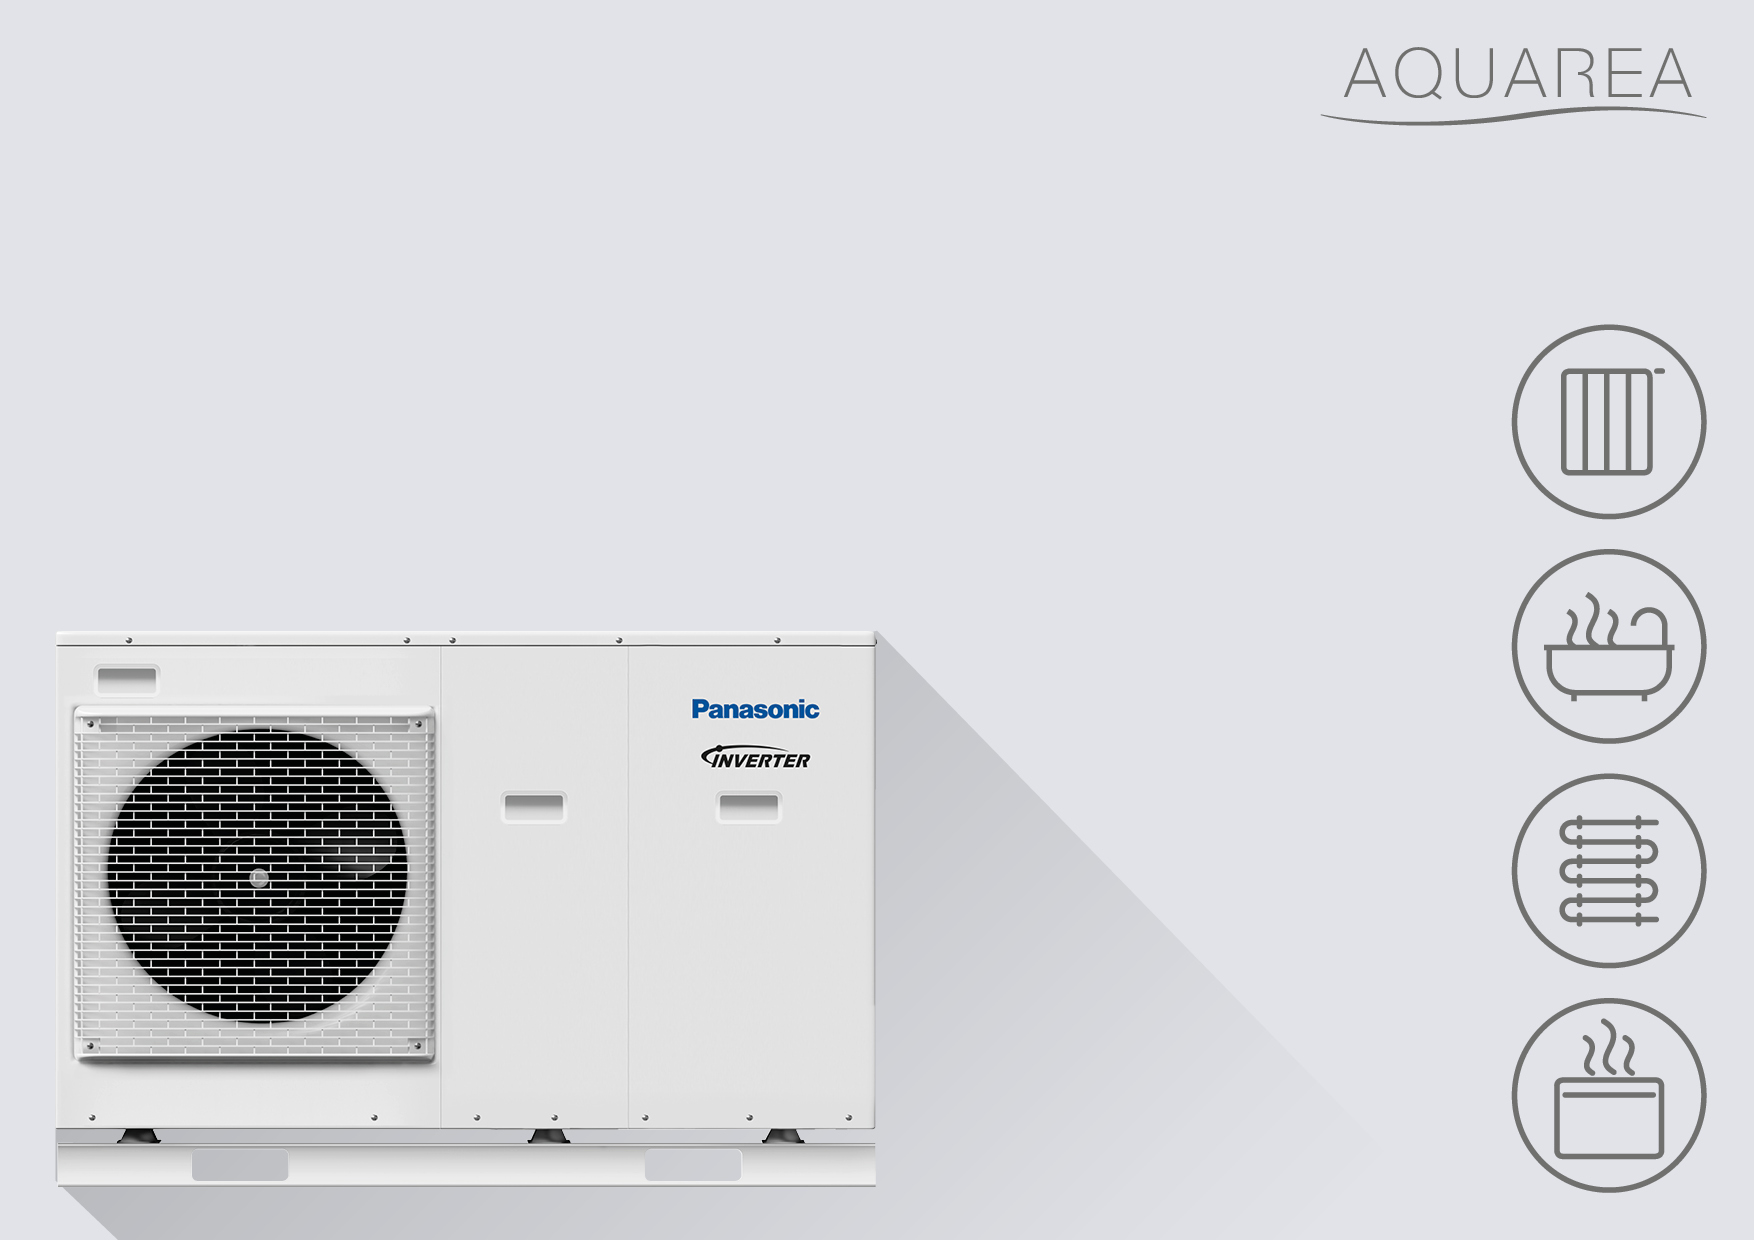 Panasonic Aquarea LT Monoblock H-Generation